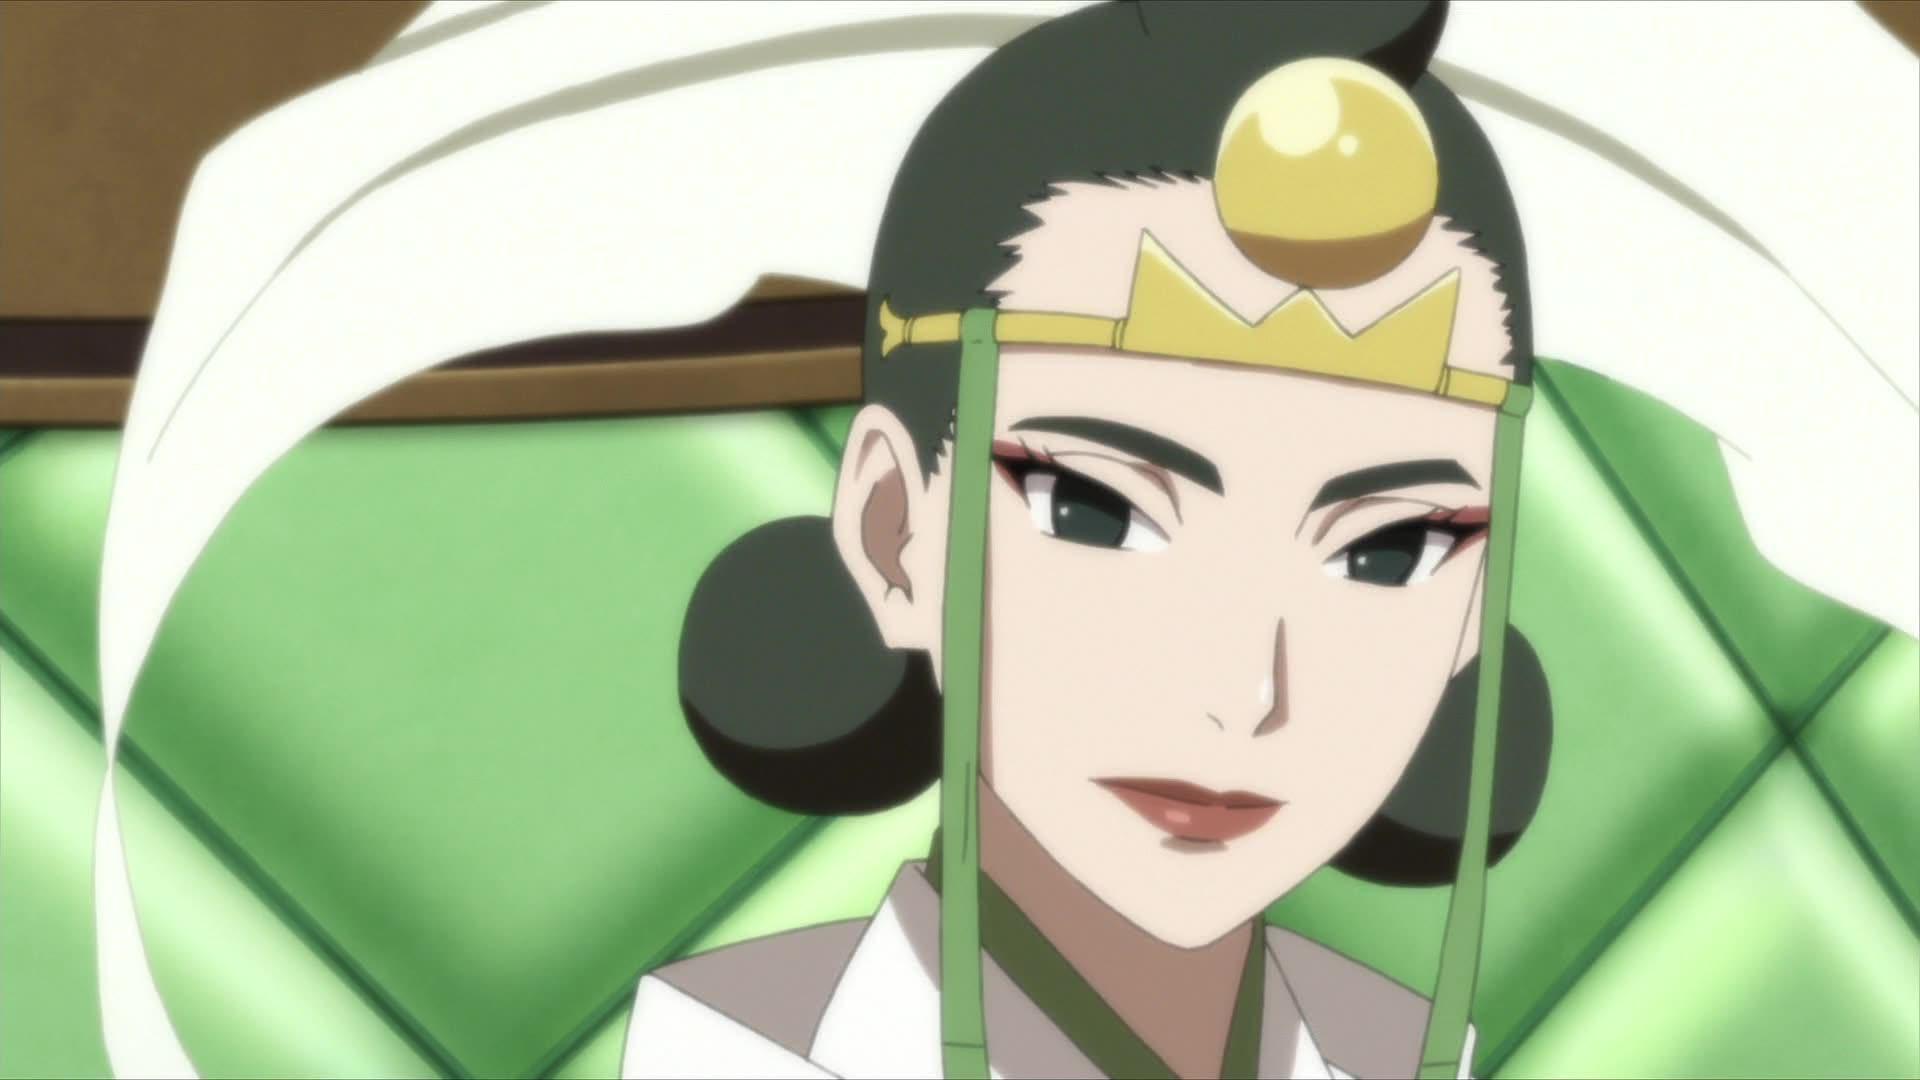 BORUTO: NARUTO NEXT GENERATIONS Episode 75, The Trials of